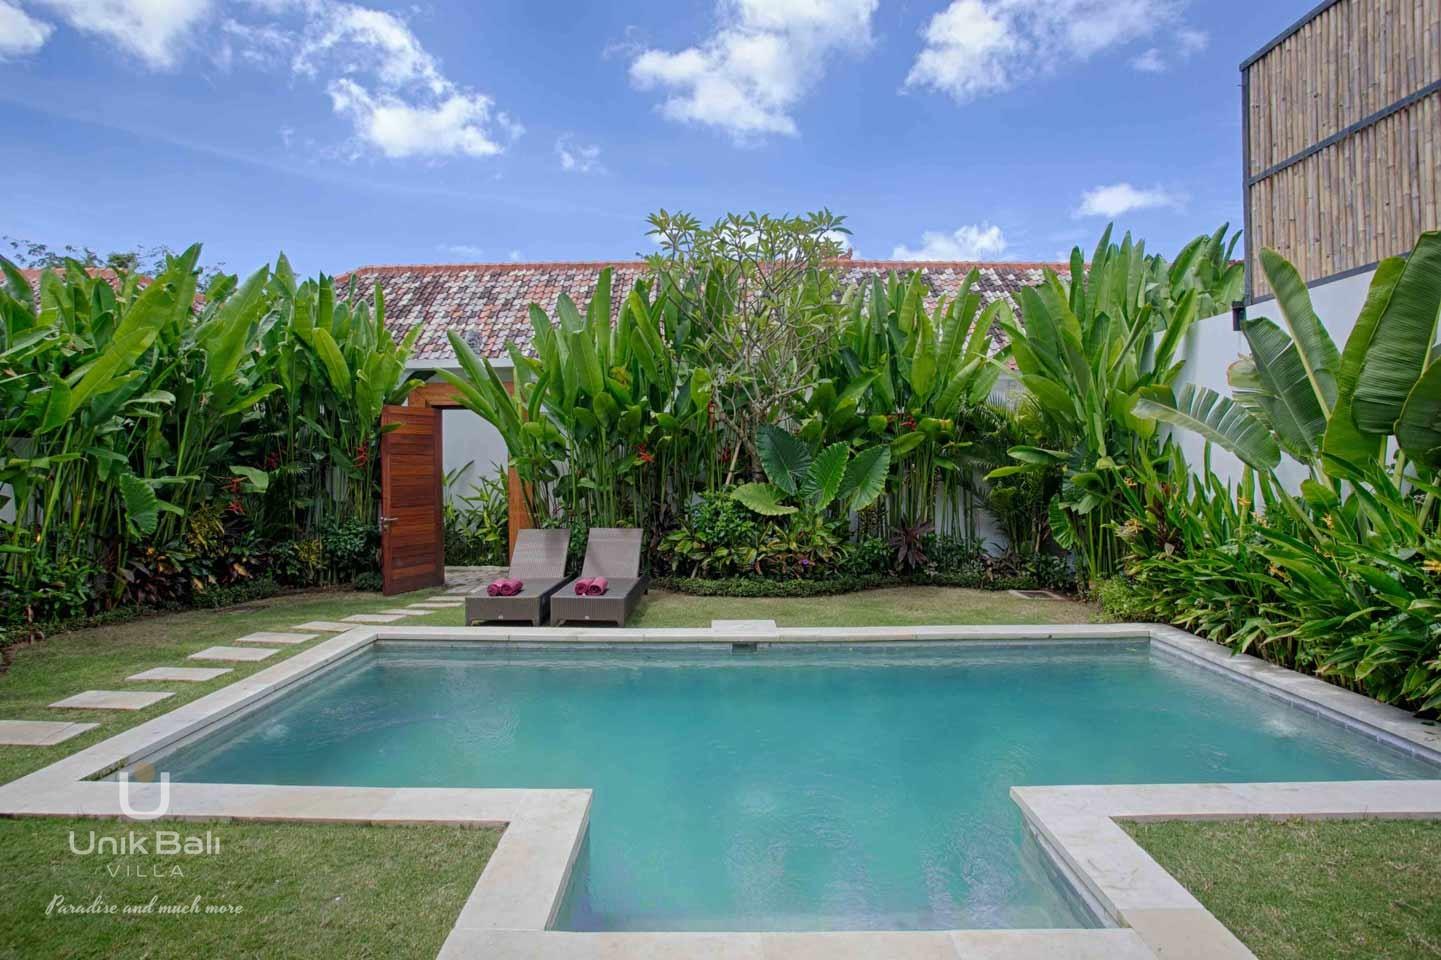 unik-bali-for-rent-shiva-bali-private-swimming-pool